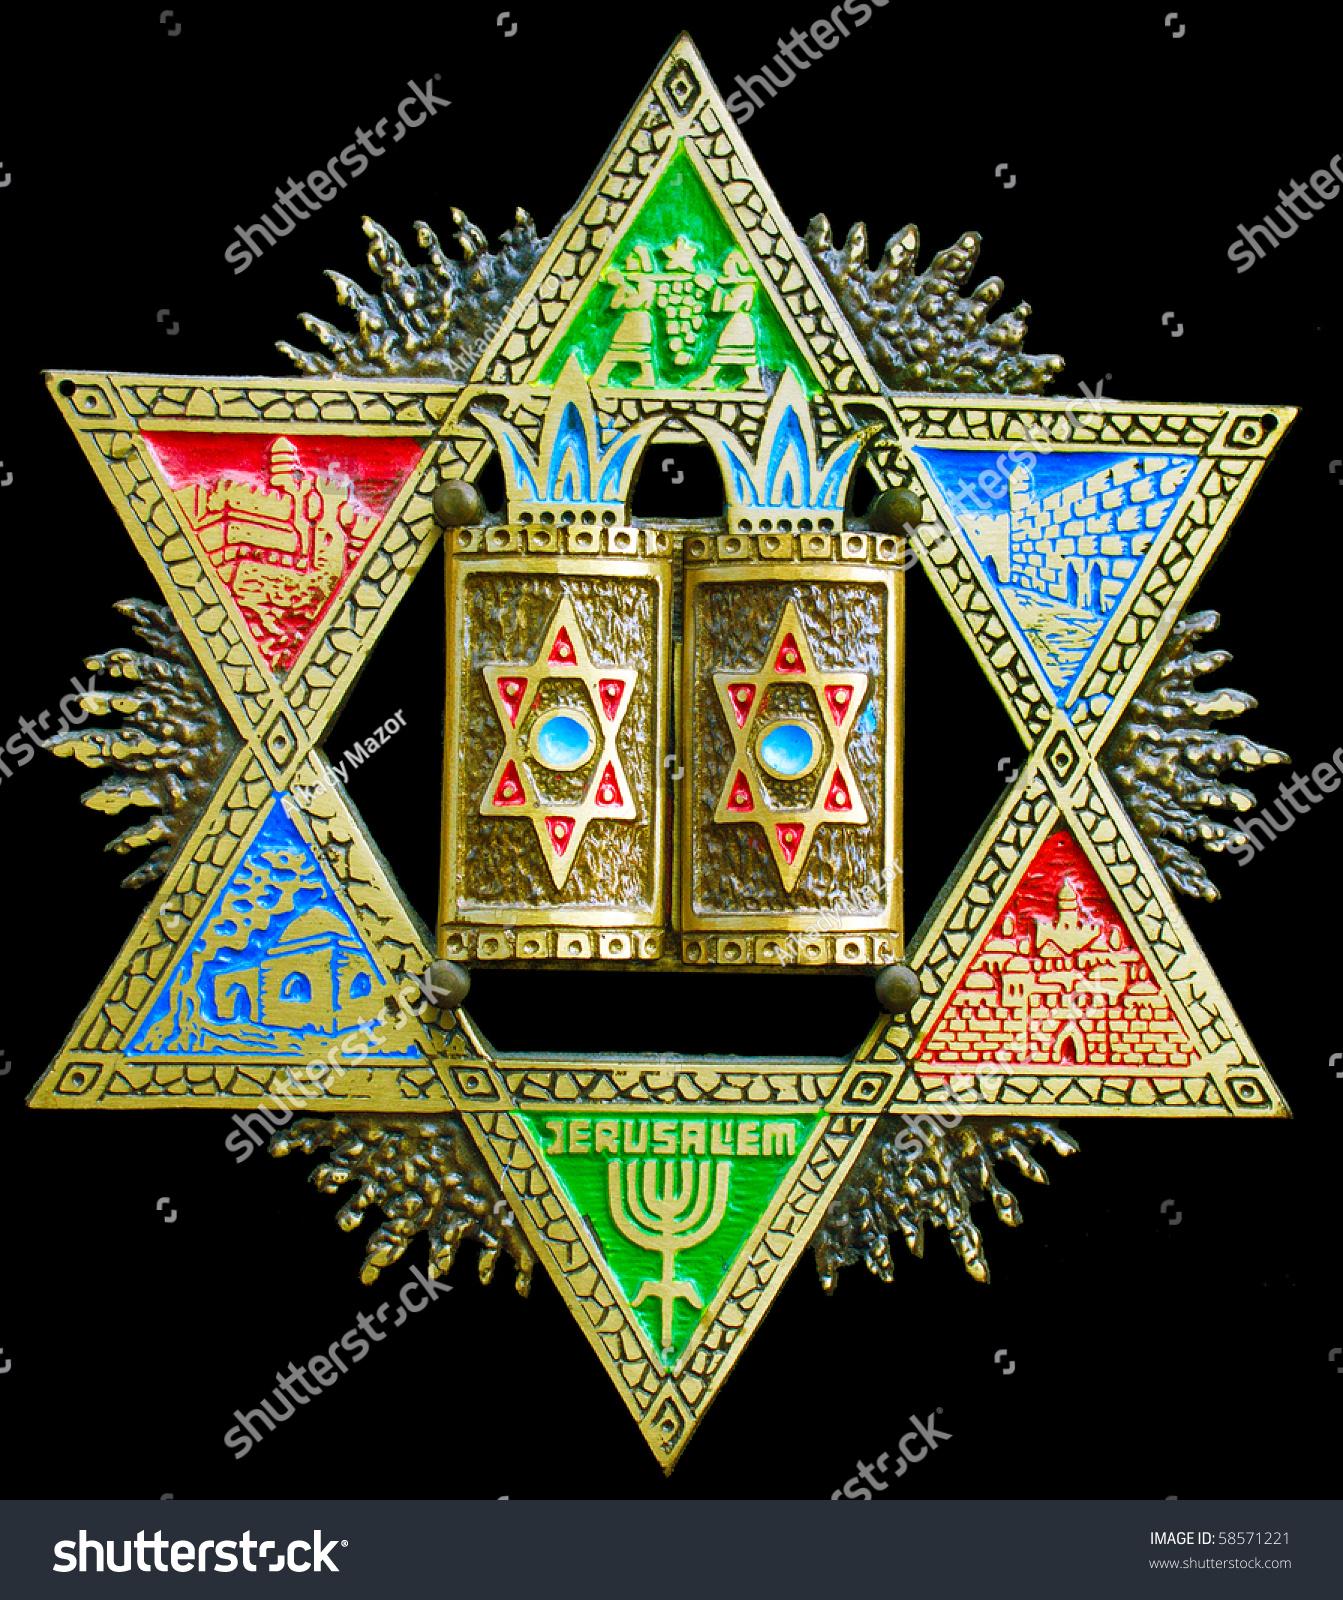 The Dodge Star And Jewish History: Antique Handmade Bronze Magen David Engraved Stock Photo